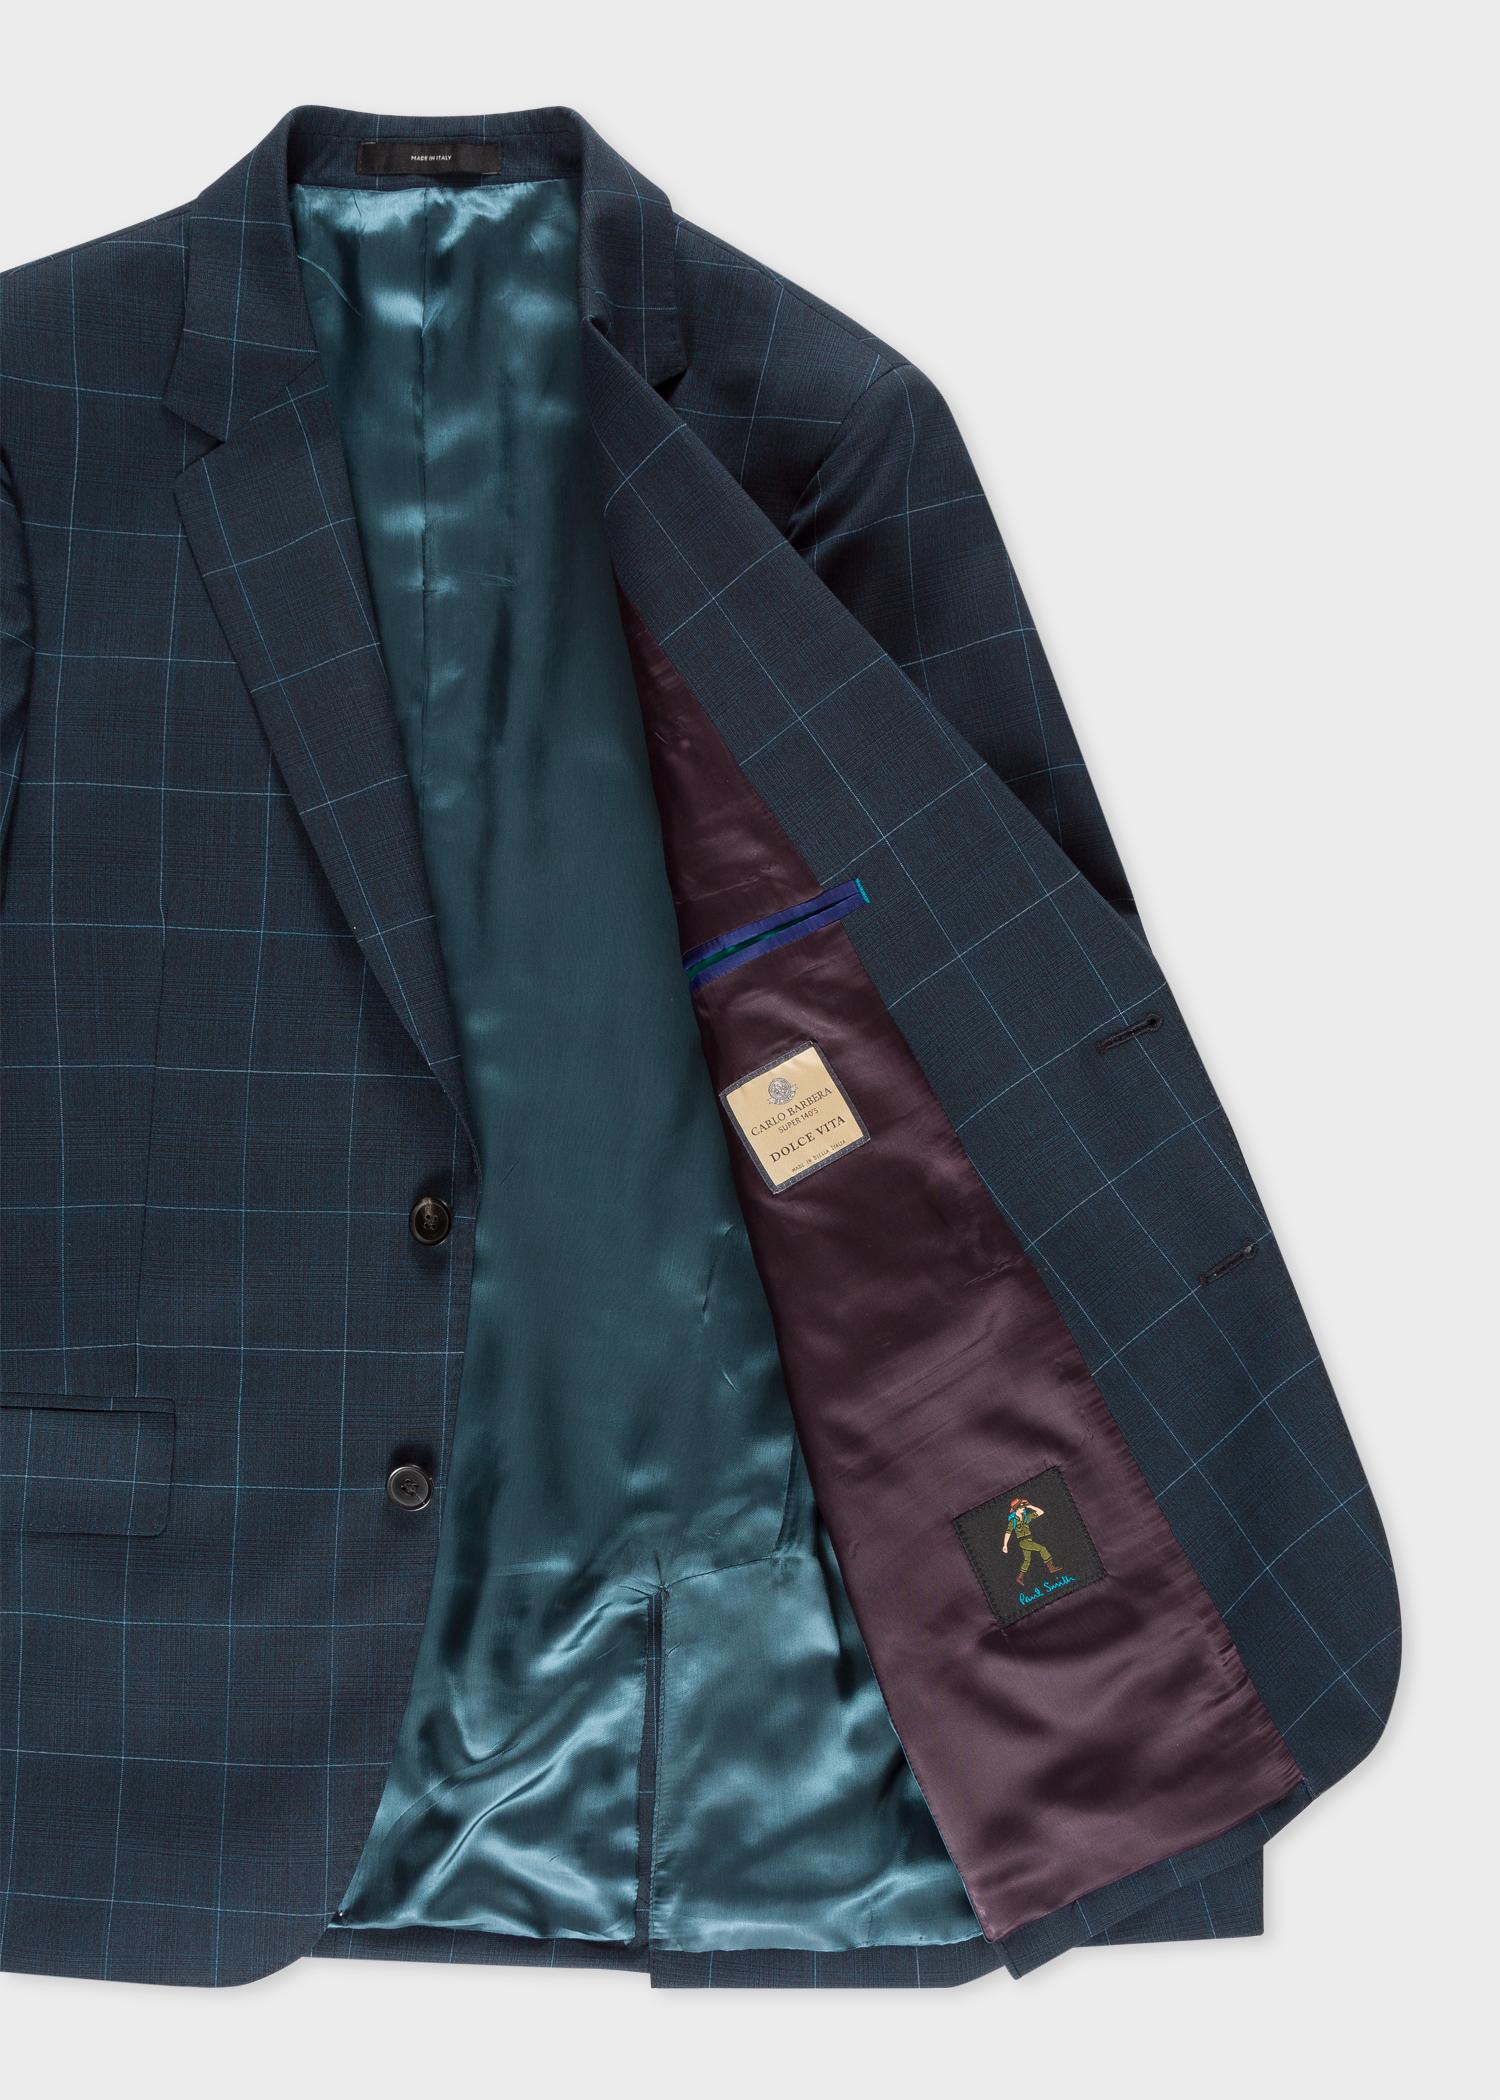 2f6bab100c81cd Blazer open View - Men's Slim-Fit Dark Navy Check Wool Suit Paul Smith